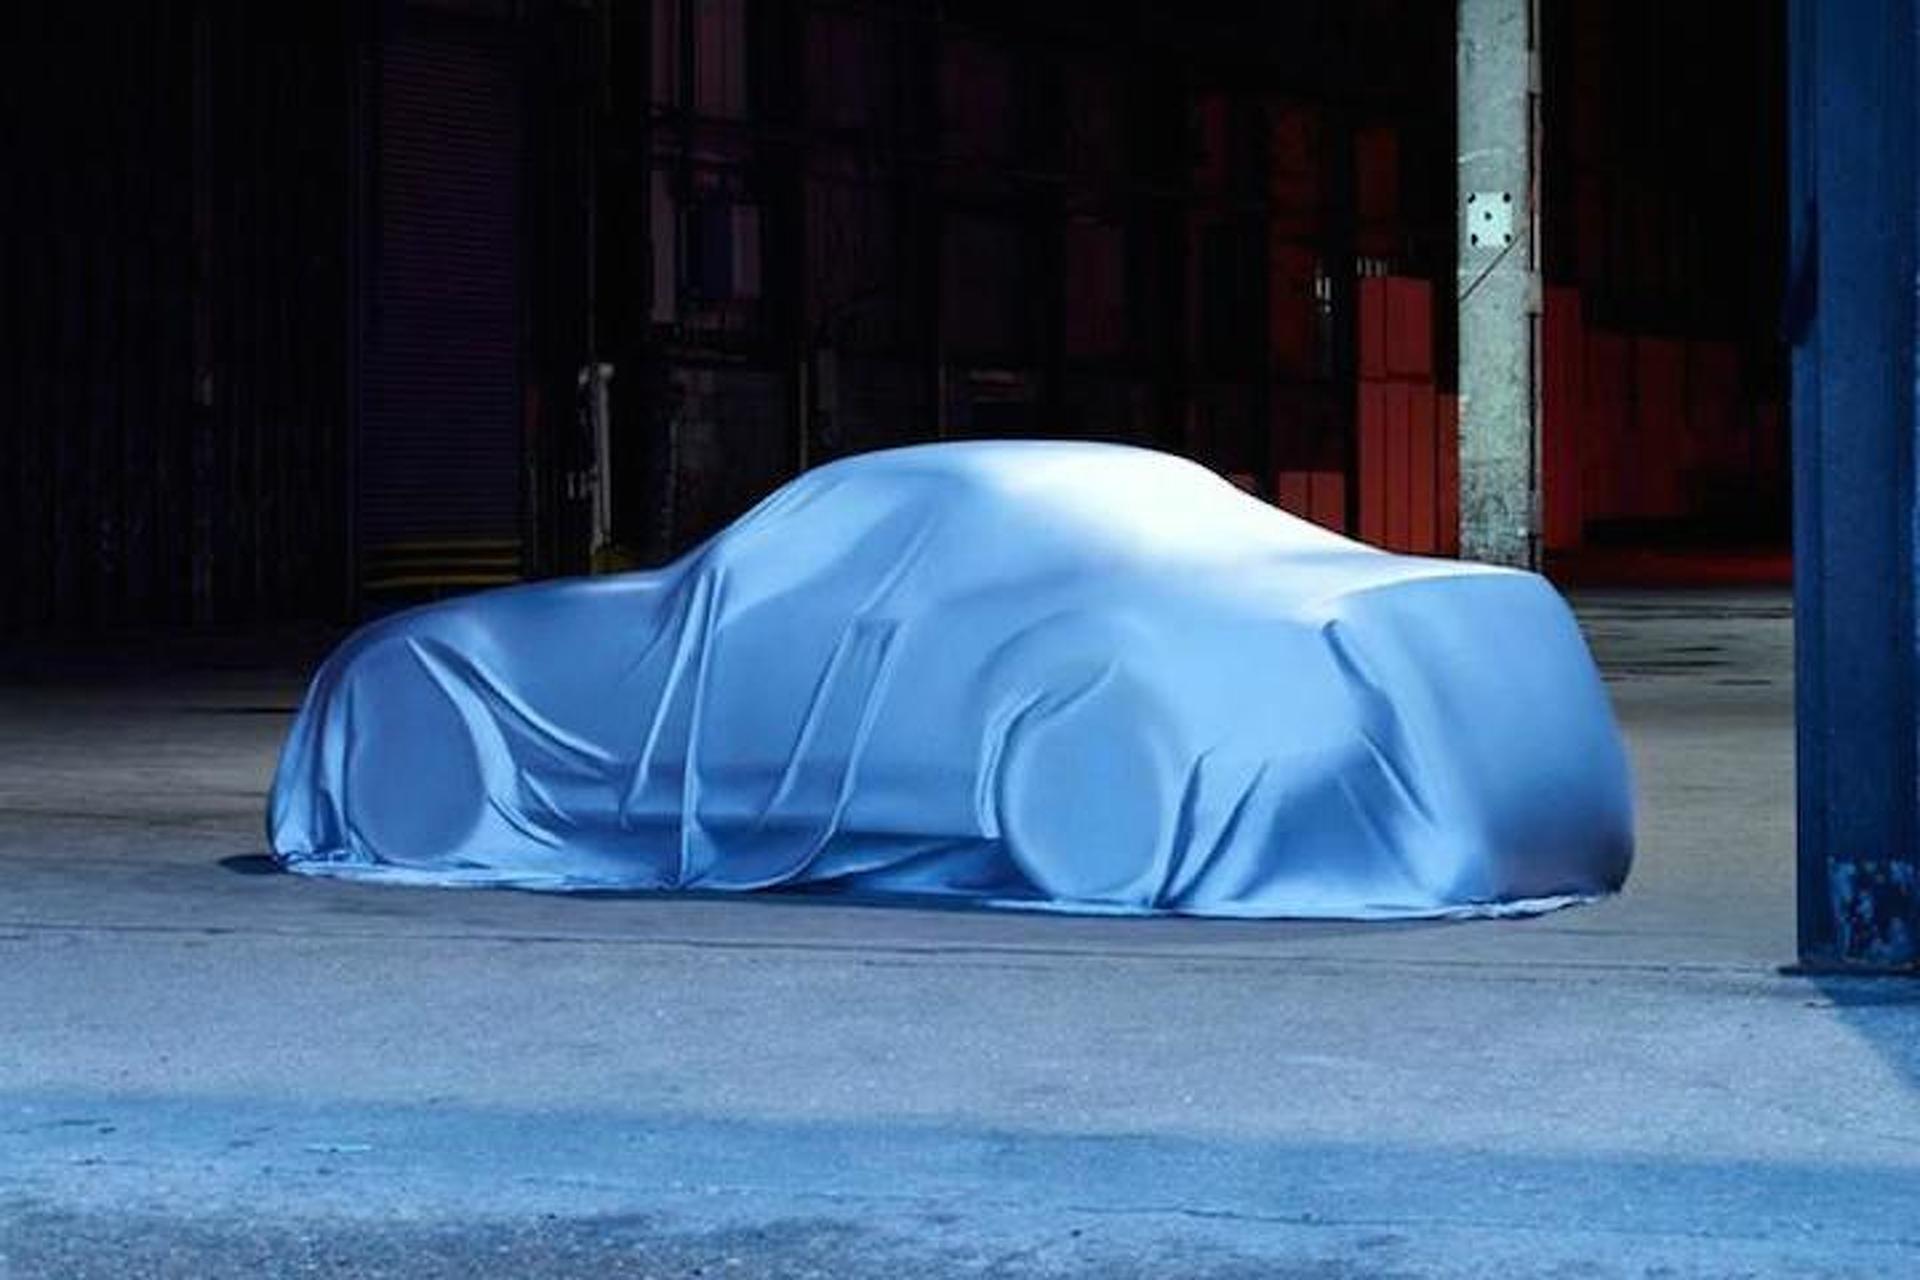 2016 Mazda MX-5 Miata Live Reveal [Video]